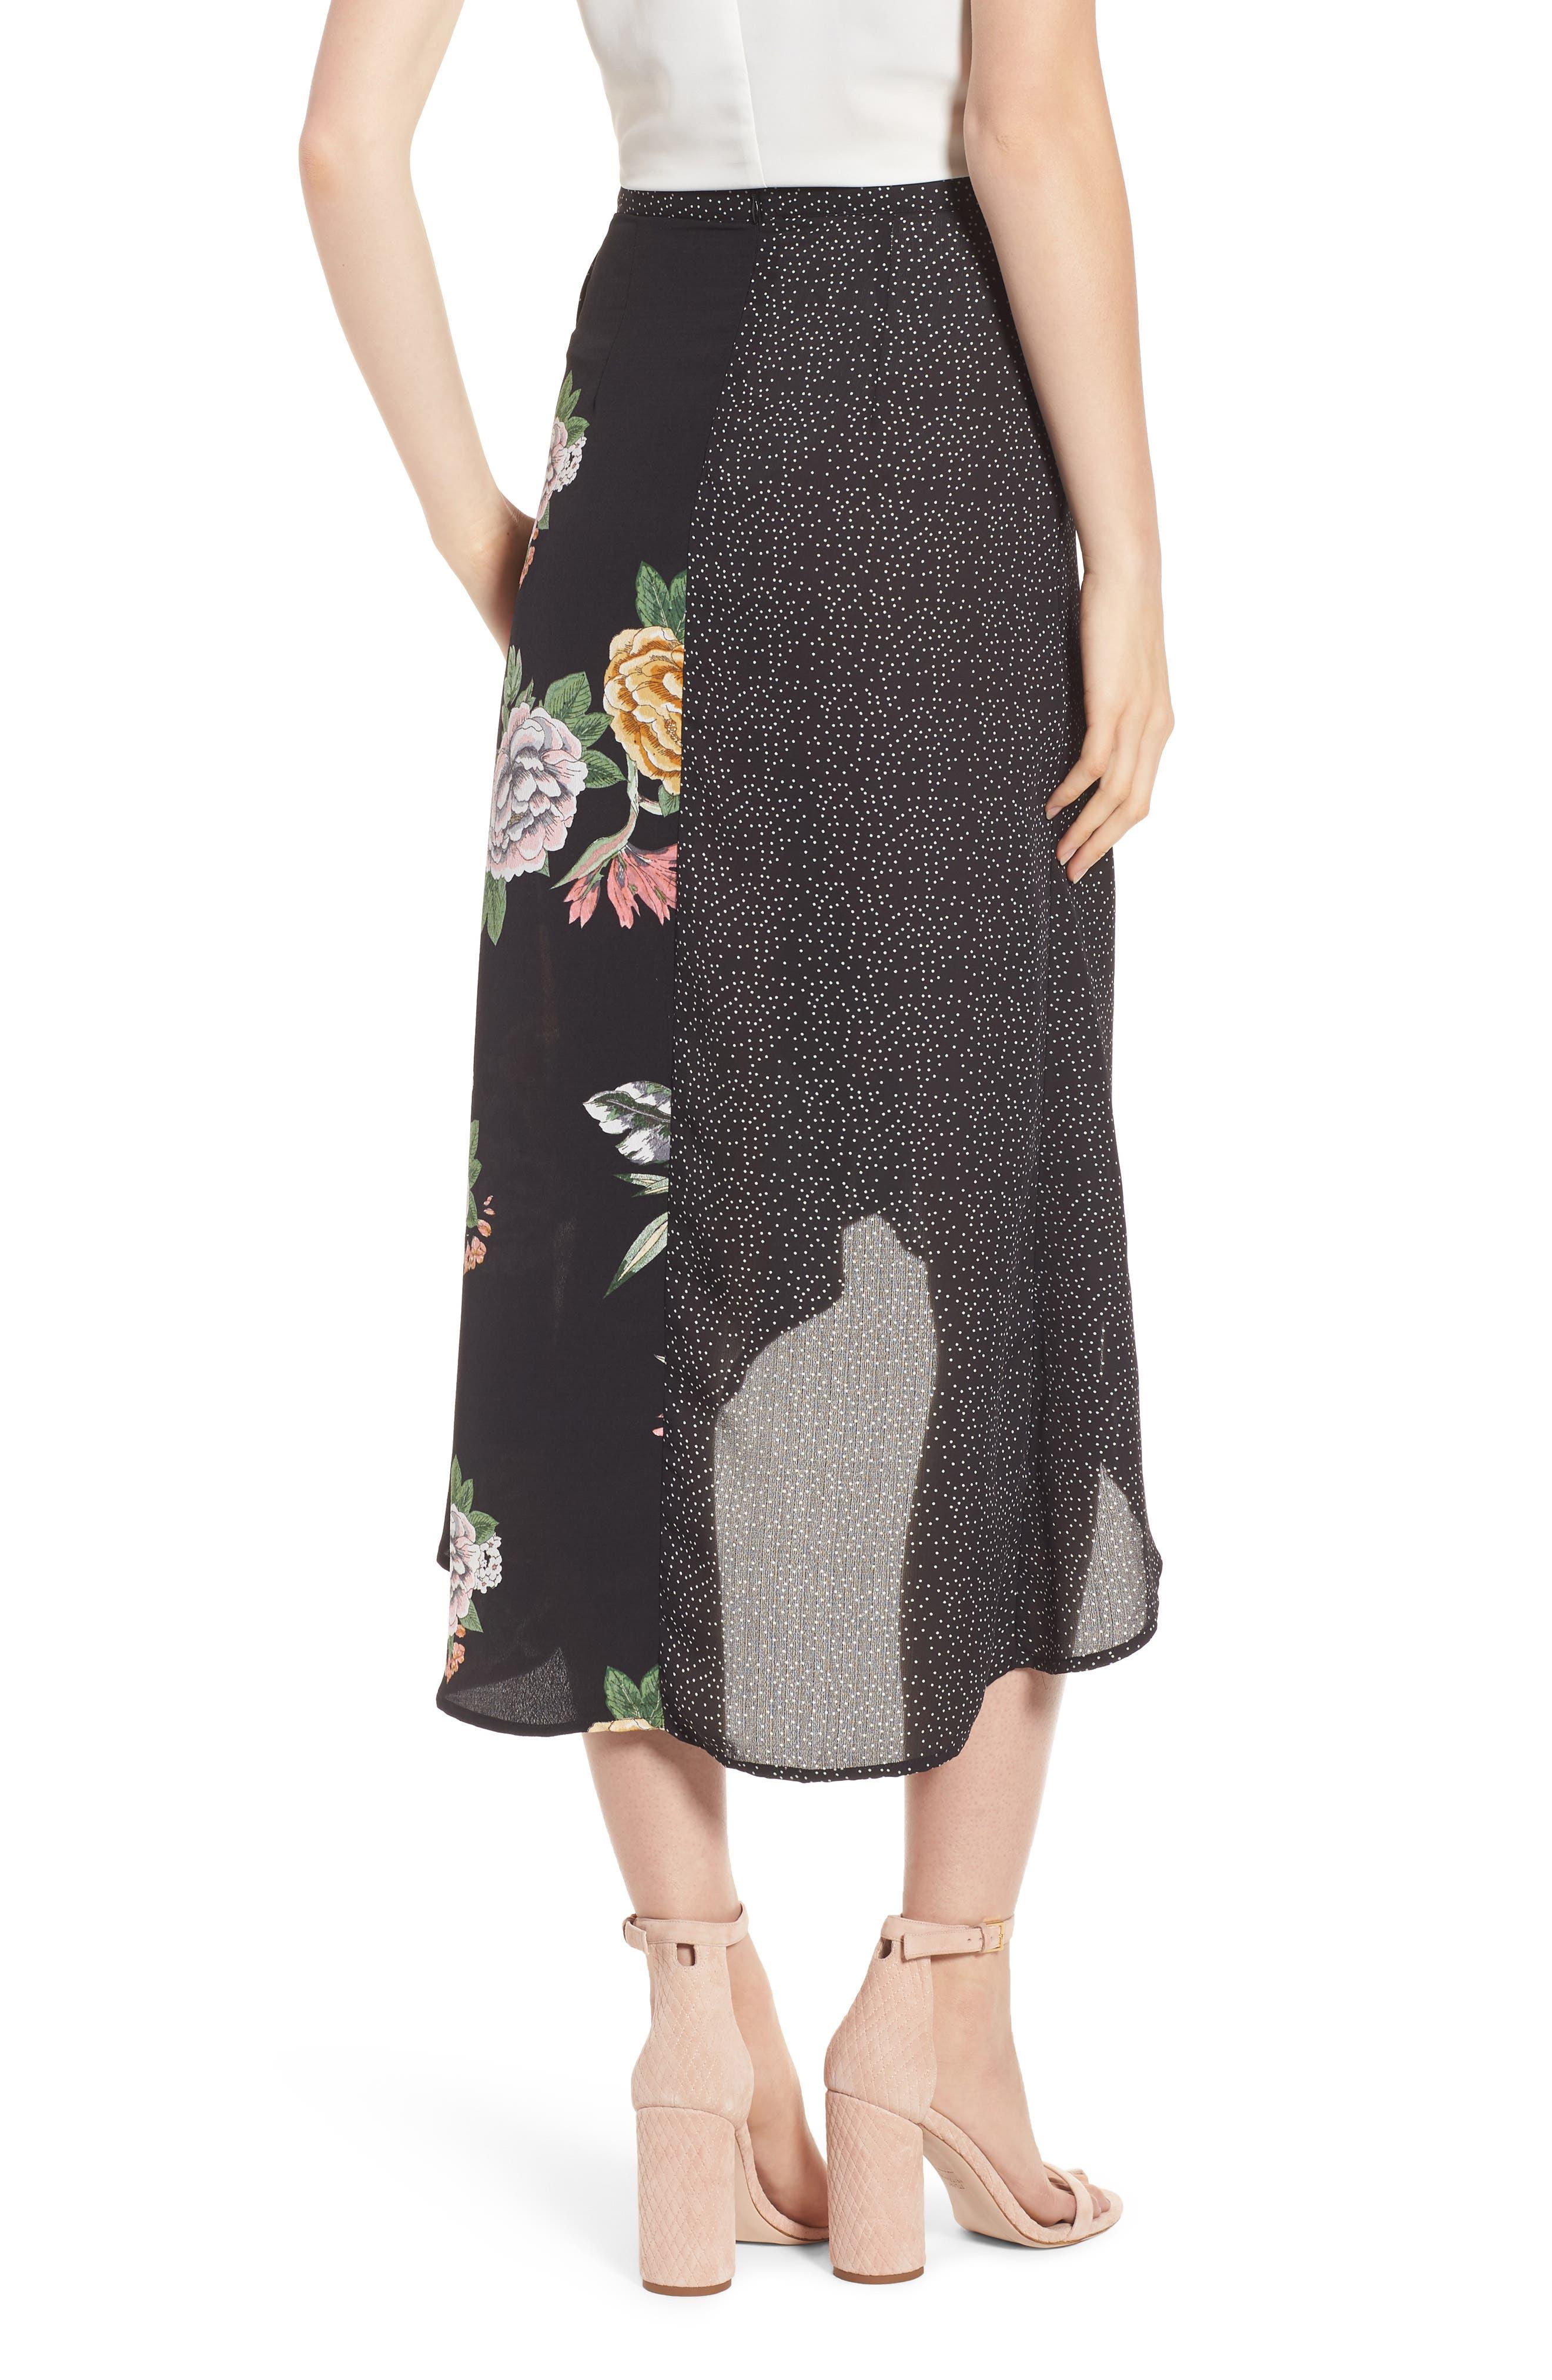 Bishop + Young Enchanted Garden Mix Media Skirt,                             Alternate thumbnail 2, color,                             ENCHANTED GARDEN PRINT